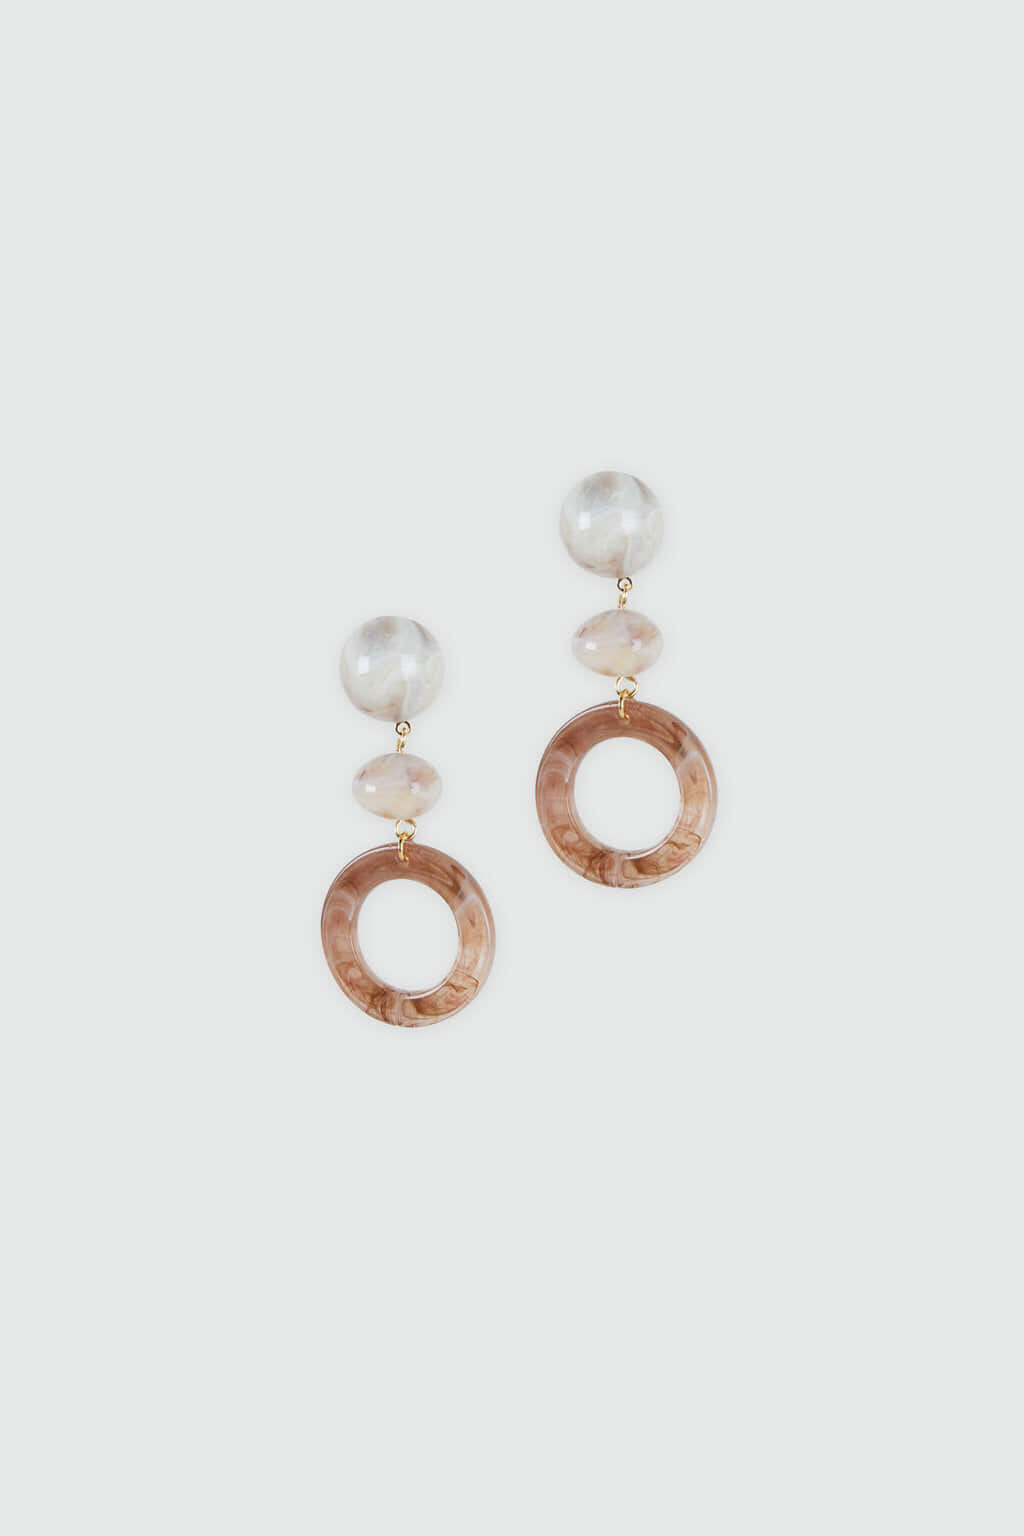 Earring J029 Gold 2